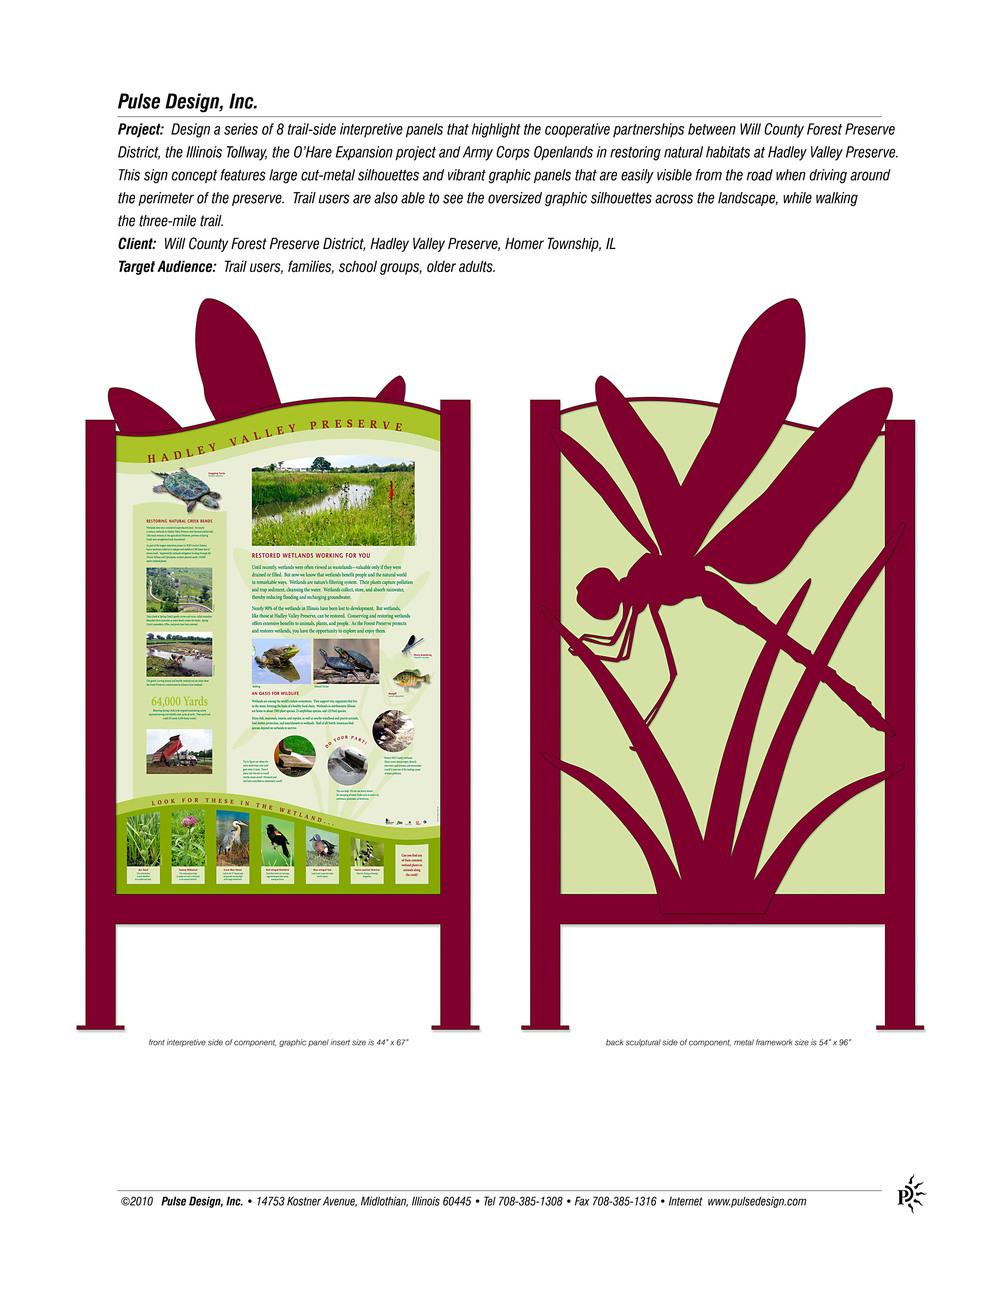 Hadley-Valley-Trail-Sign-Dragonfly-Lg-Pulse-Design-Inc.jpg